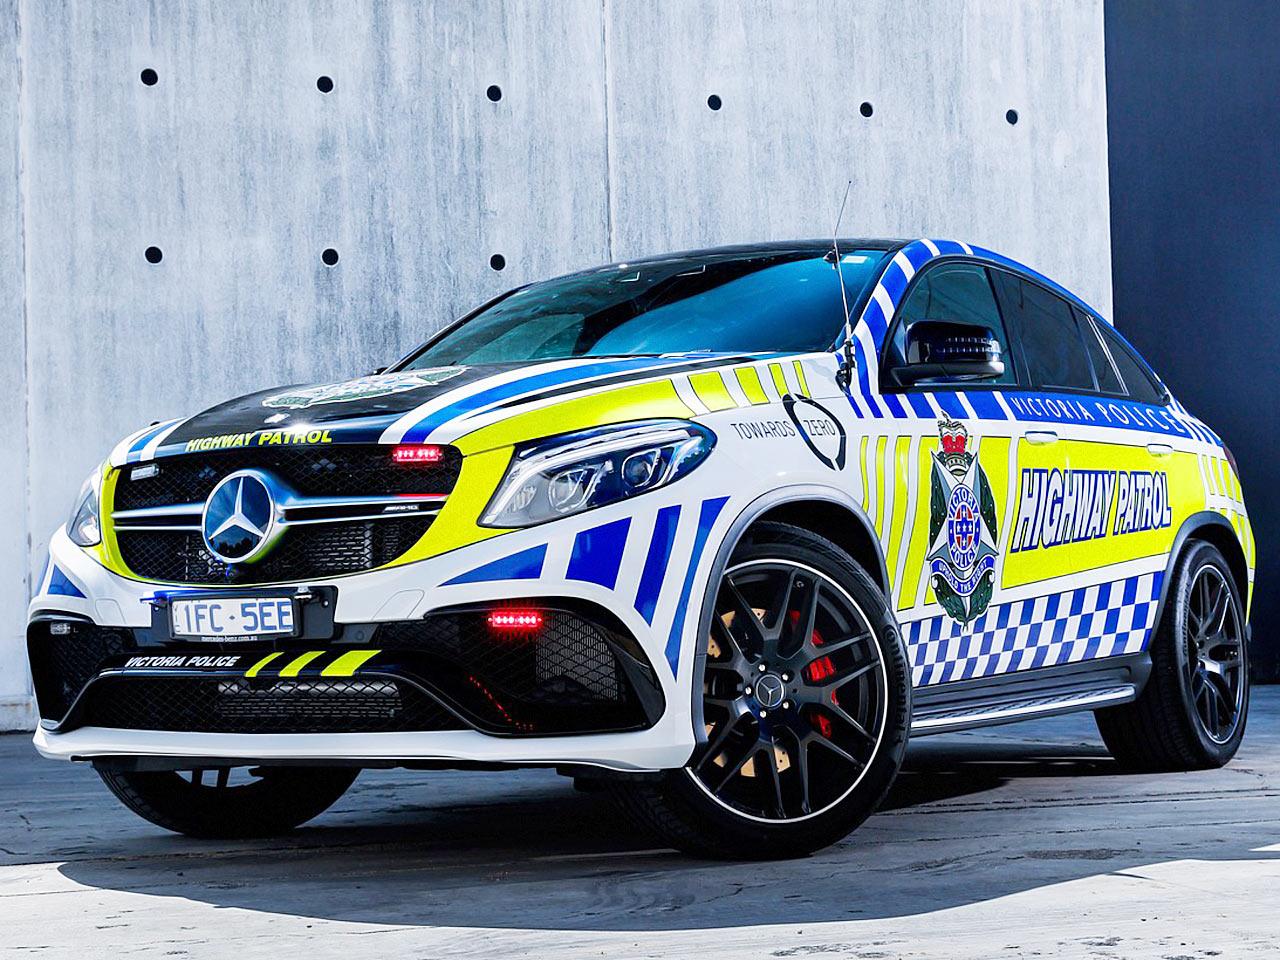 VW Golf Sportwagen >> Mercedes-AMG GLE 63 S Coupé: Polizeiauto | autozeitung.de